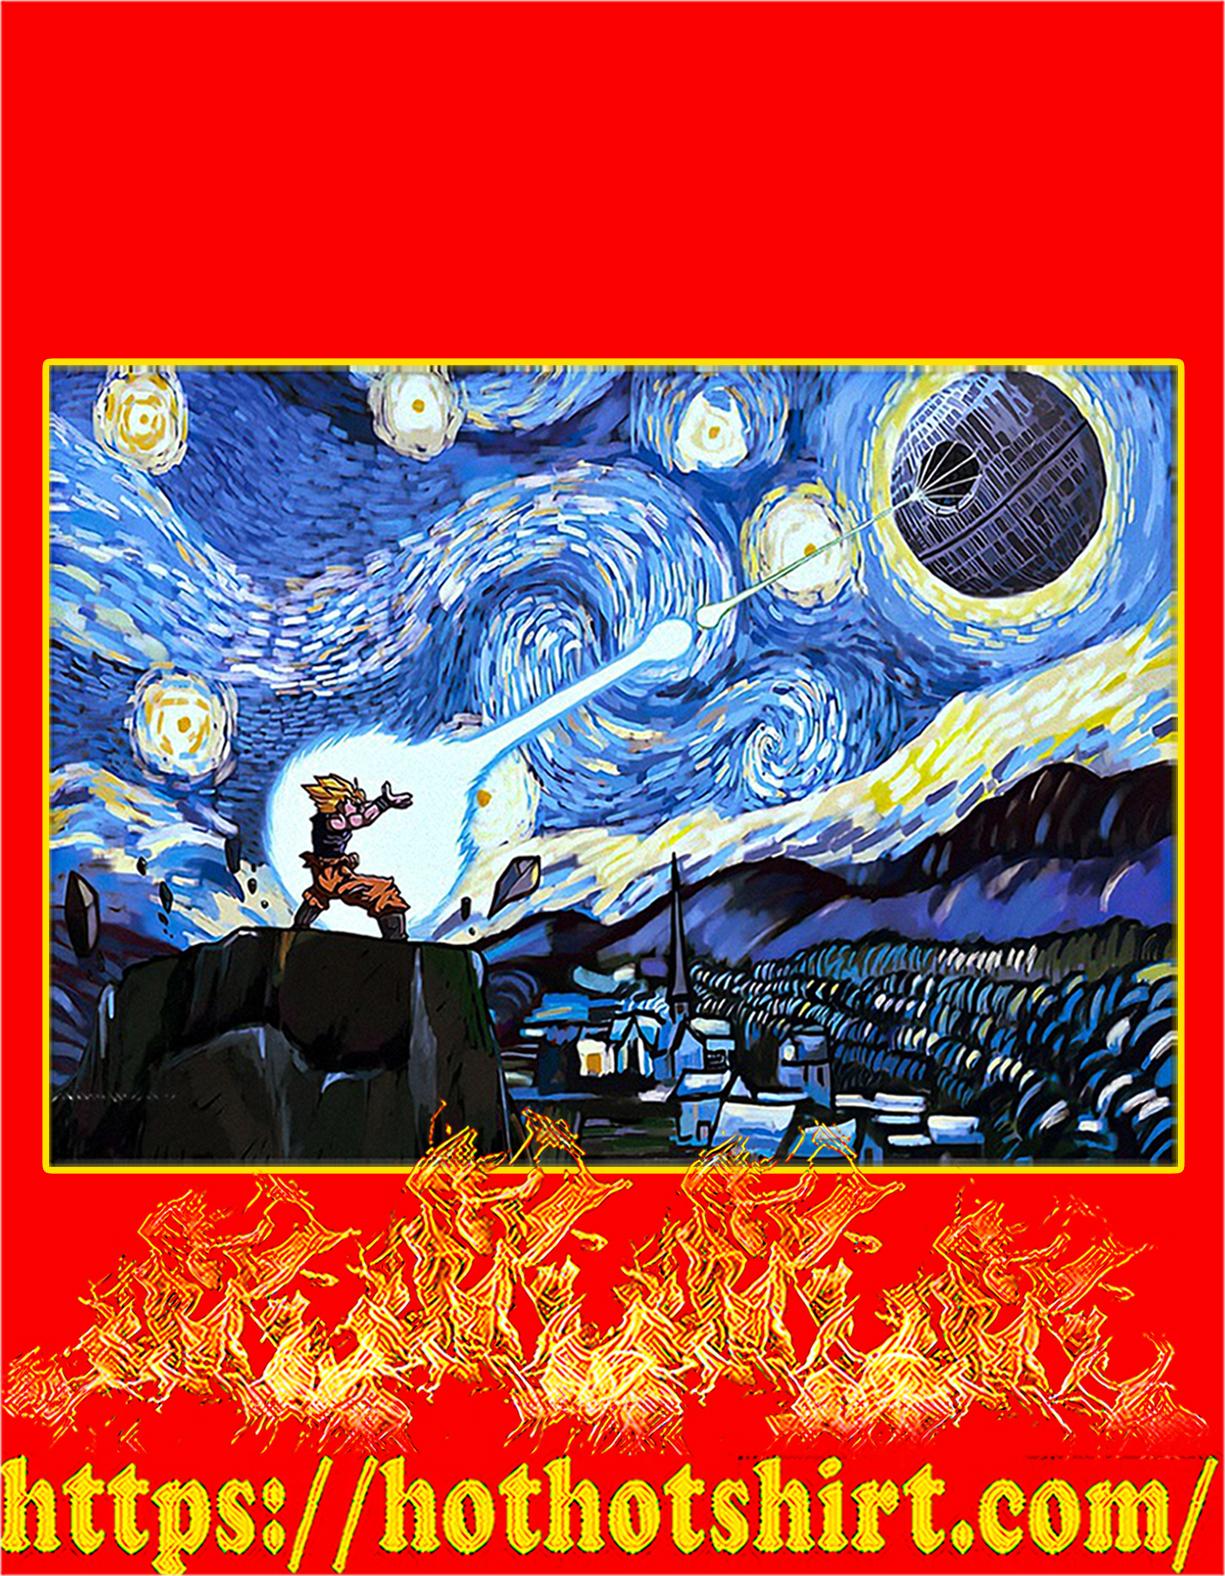 Goku vs Death Star starry night van gogh poster - A4